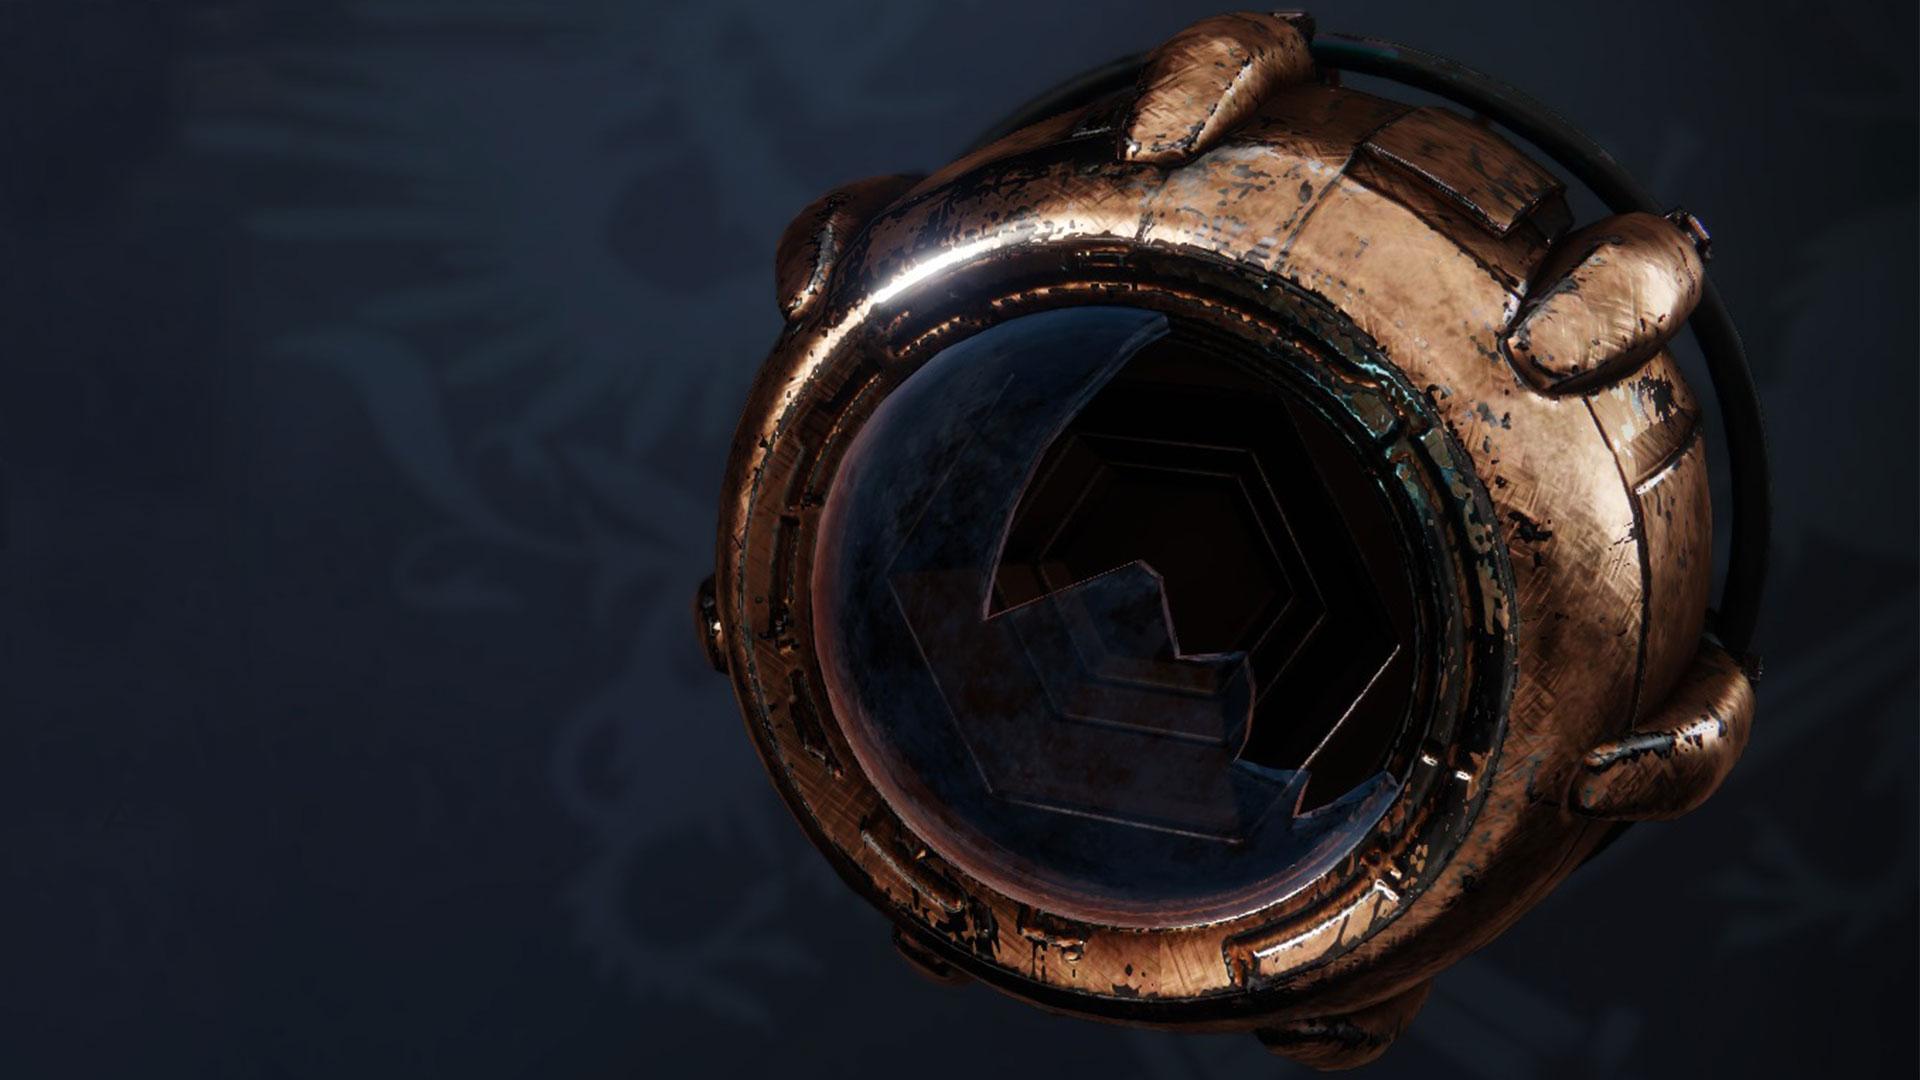 Destiny 2's Seasonal Artifact, The Gate Lord's Eye